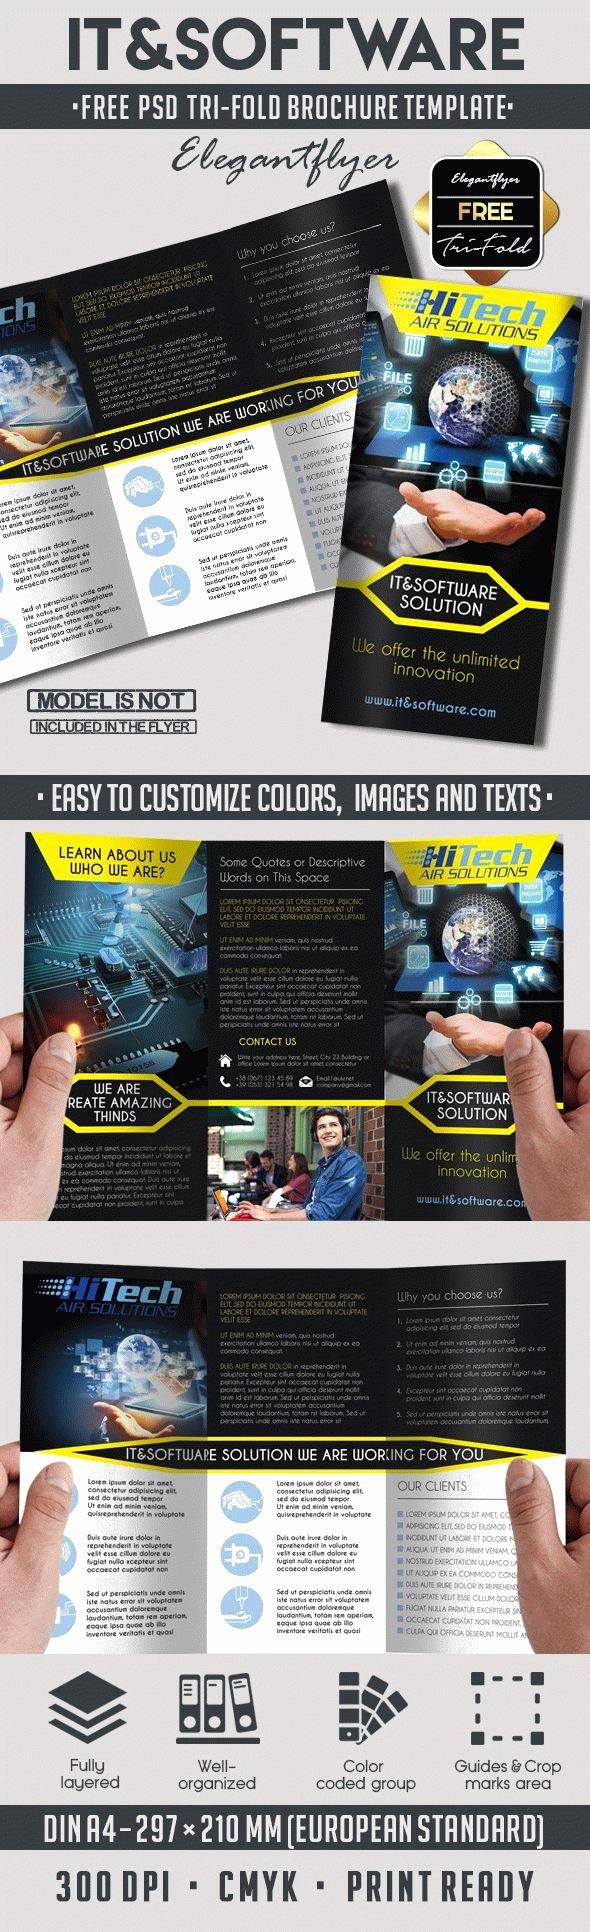 Tri Fold Brochure Template Psd Unique Free It and software Tri Fold Brochure – by Elegantflyer